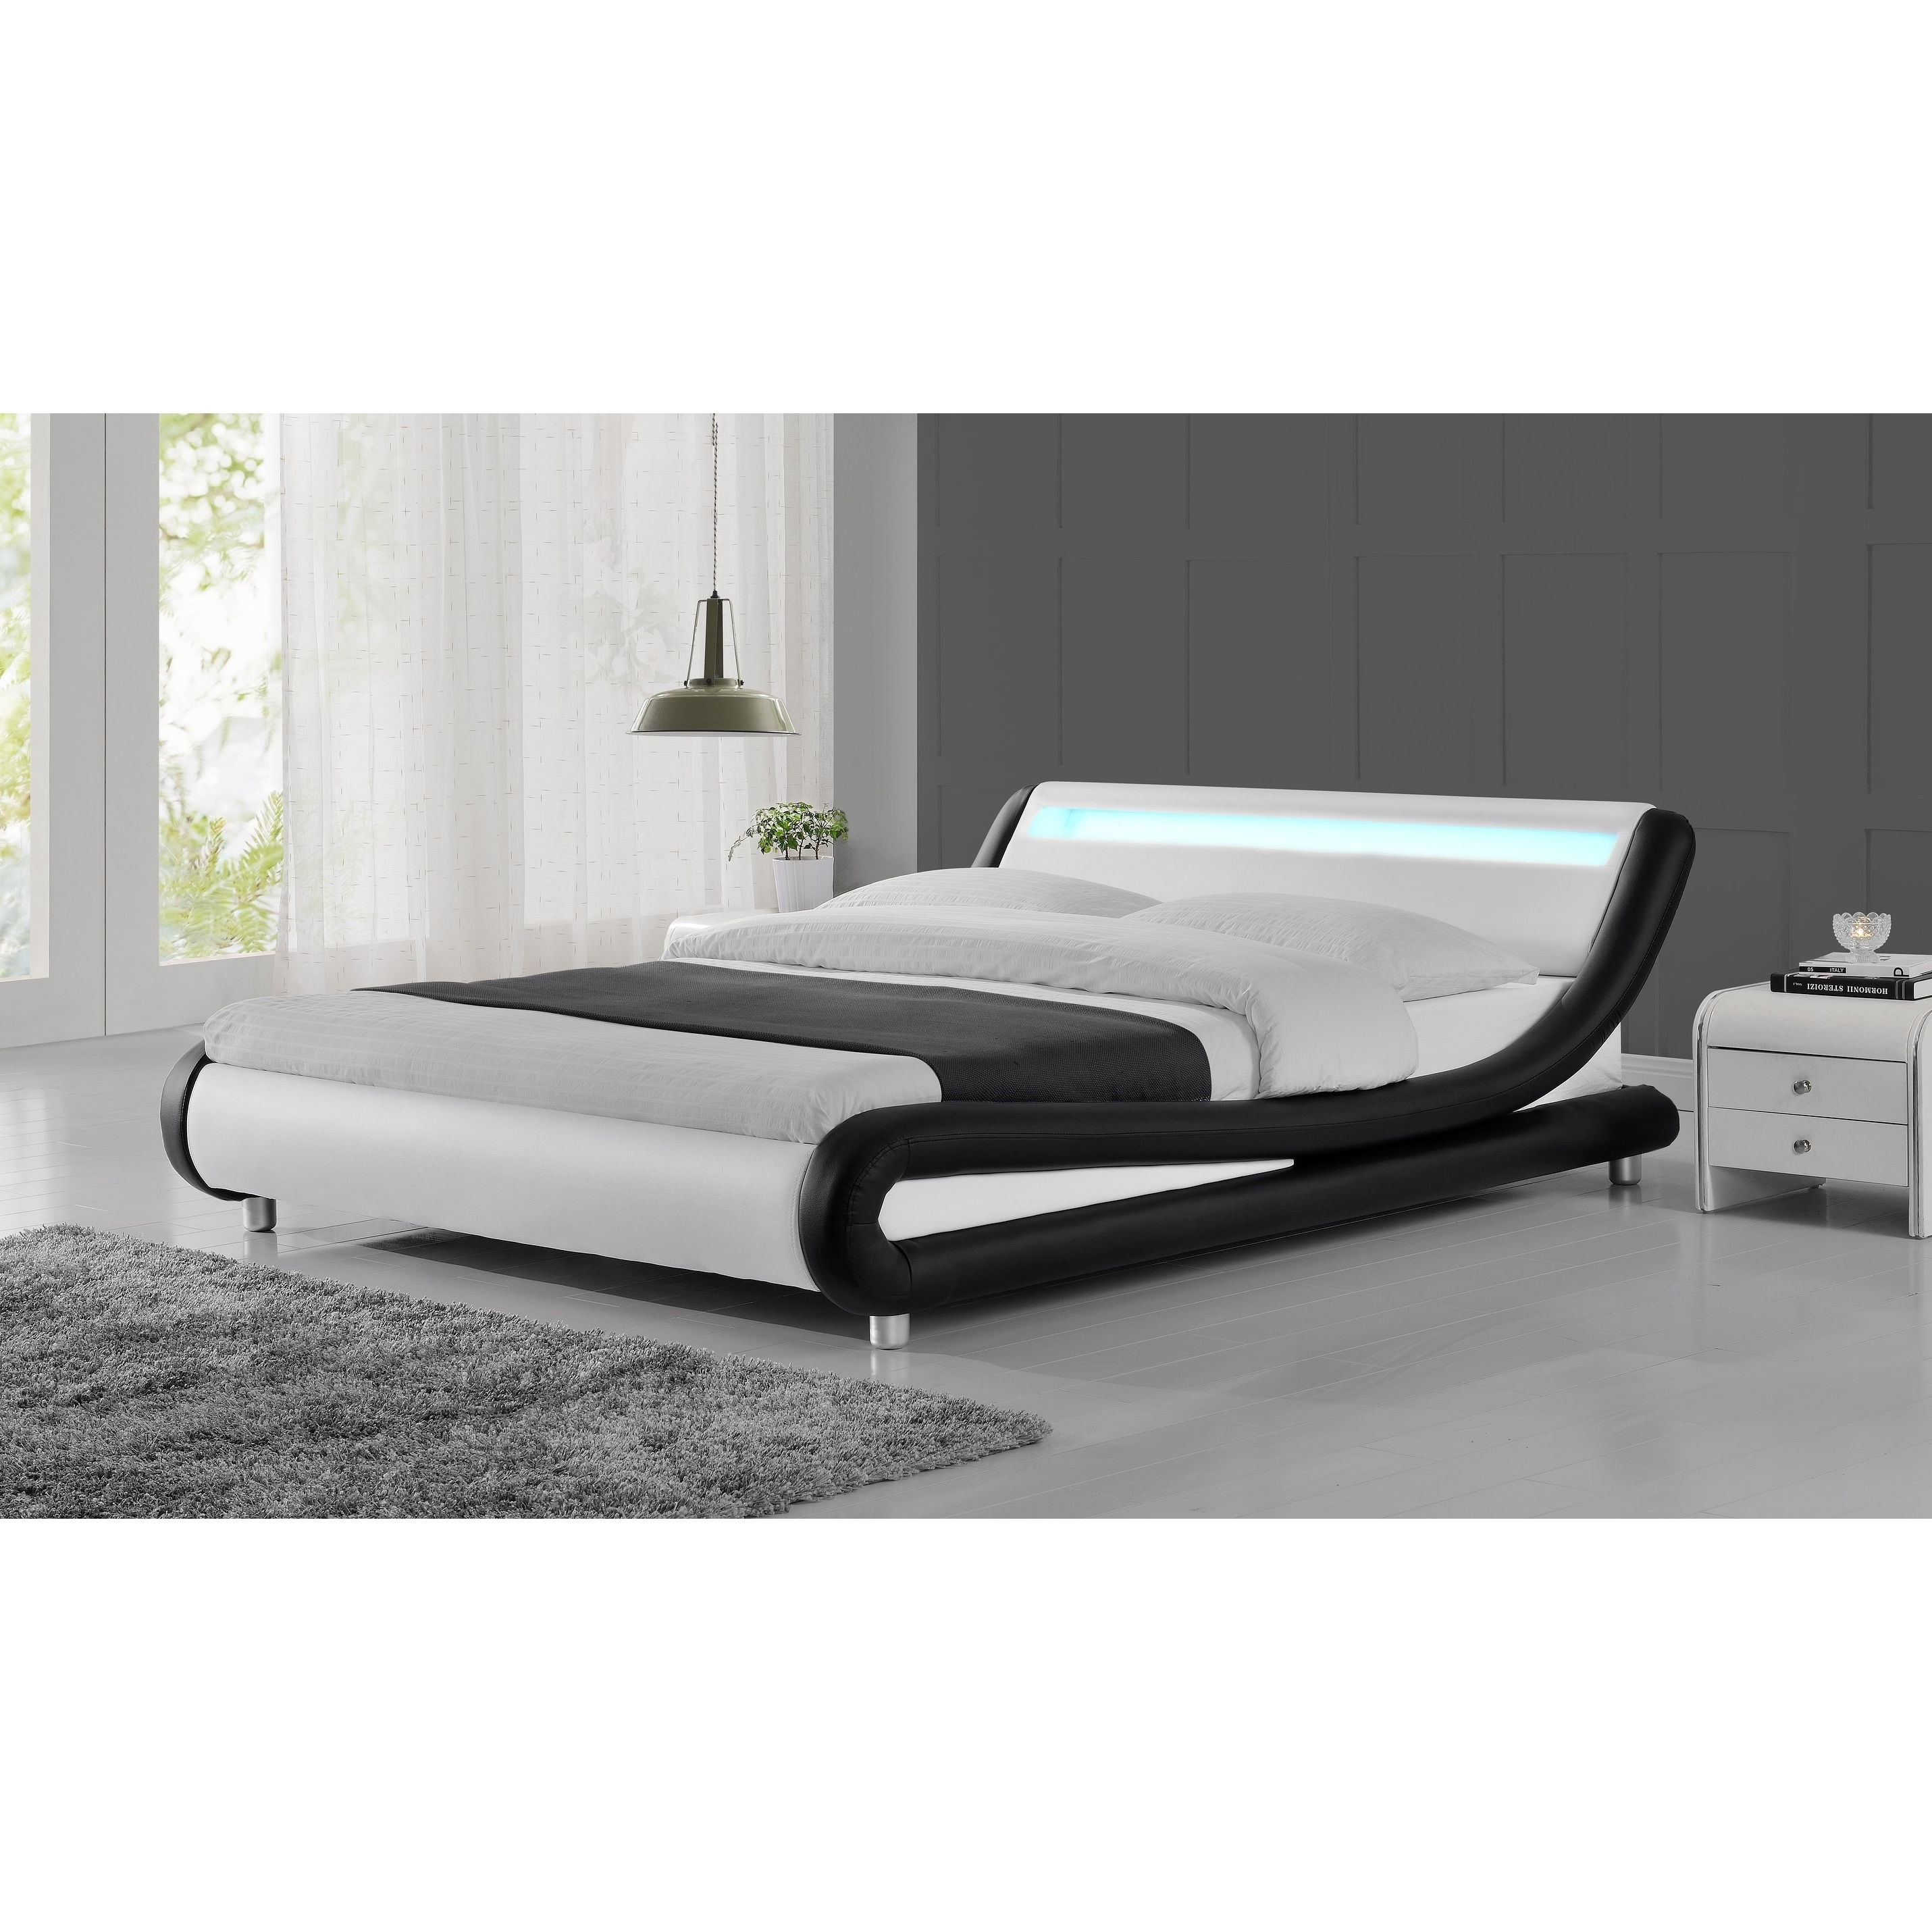 Zender Modern Curved Black And White Platform Bed Overstock 27617431 California King